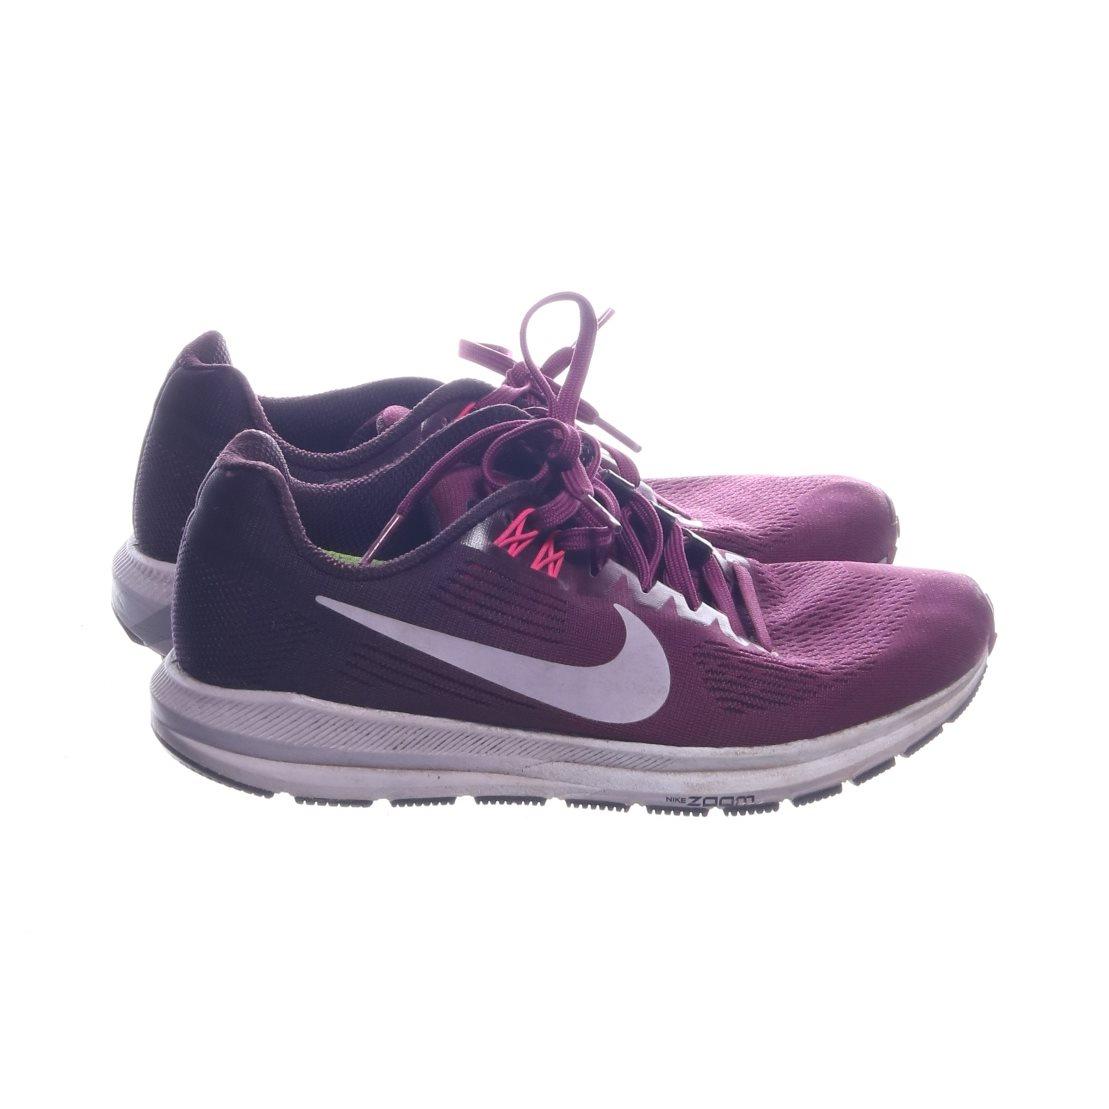 purchase cheap b1154 cc7bd Nike, Träningsskor, Strl  36.5, Zoom Structure 21, Mörklila Lila